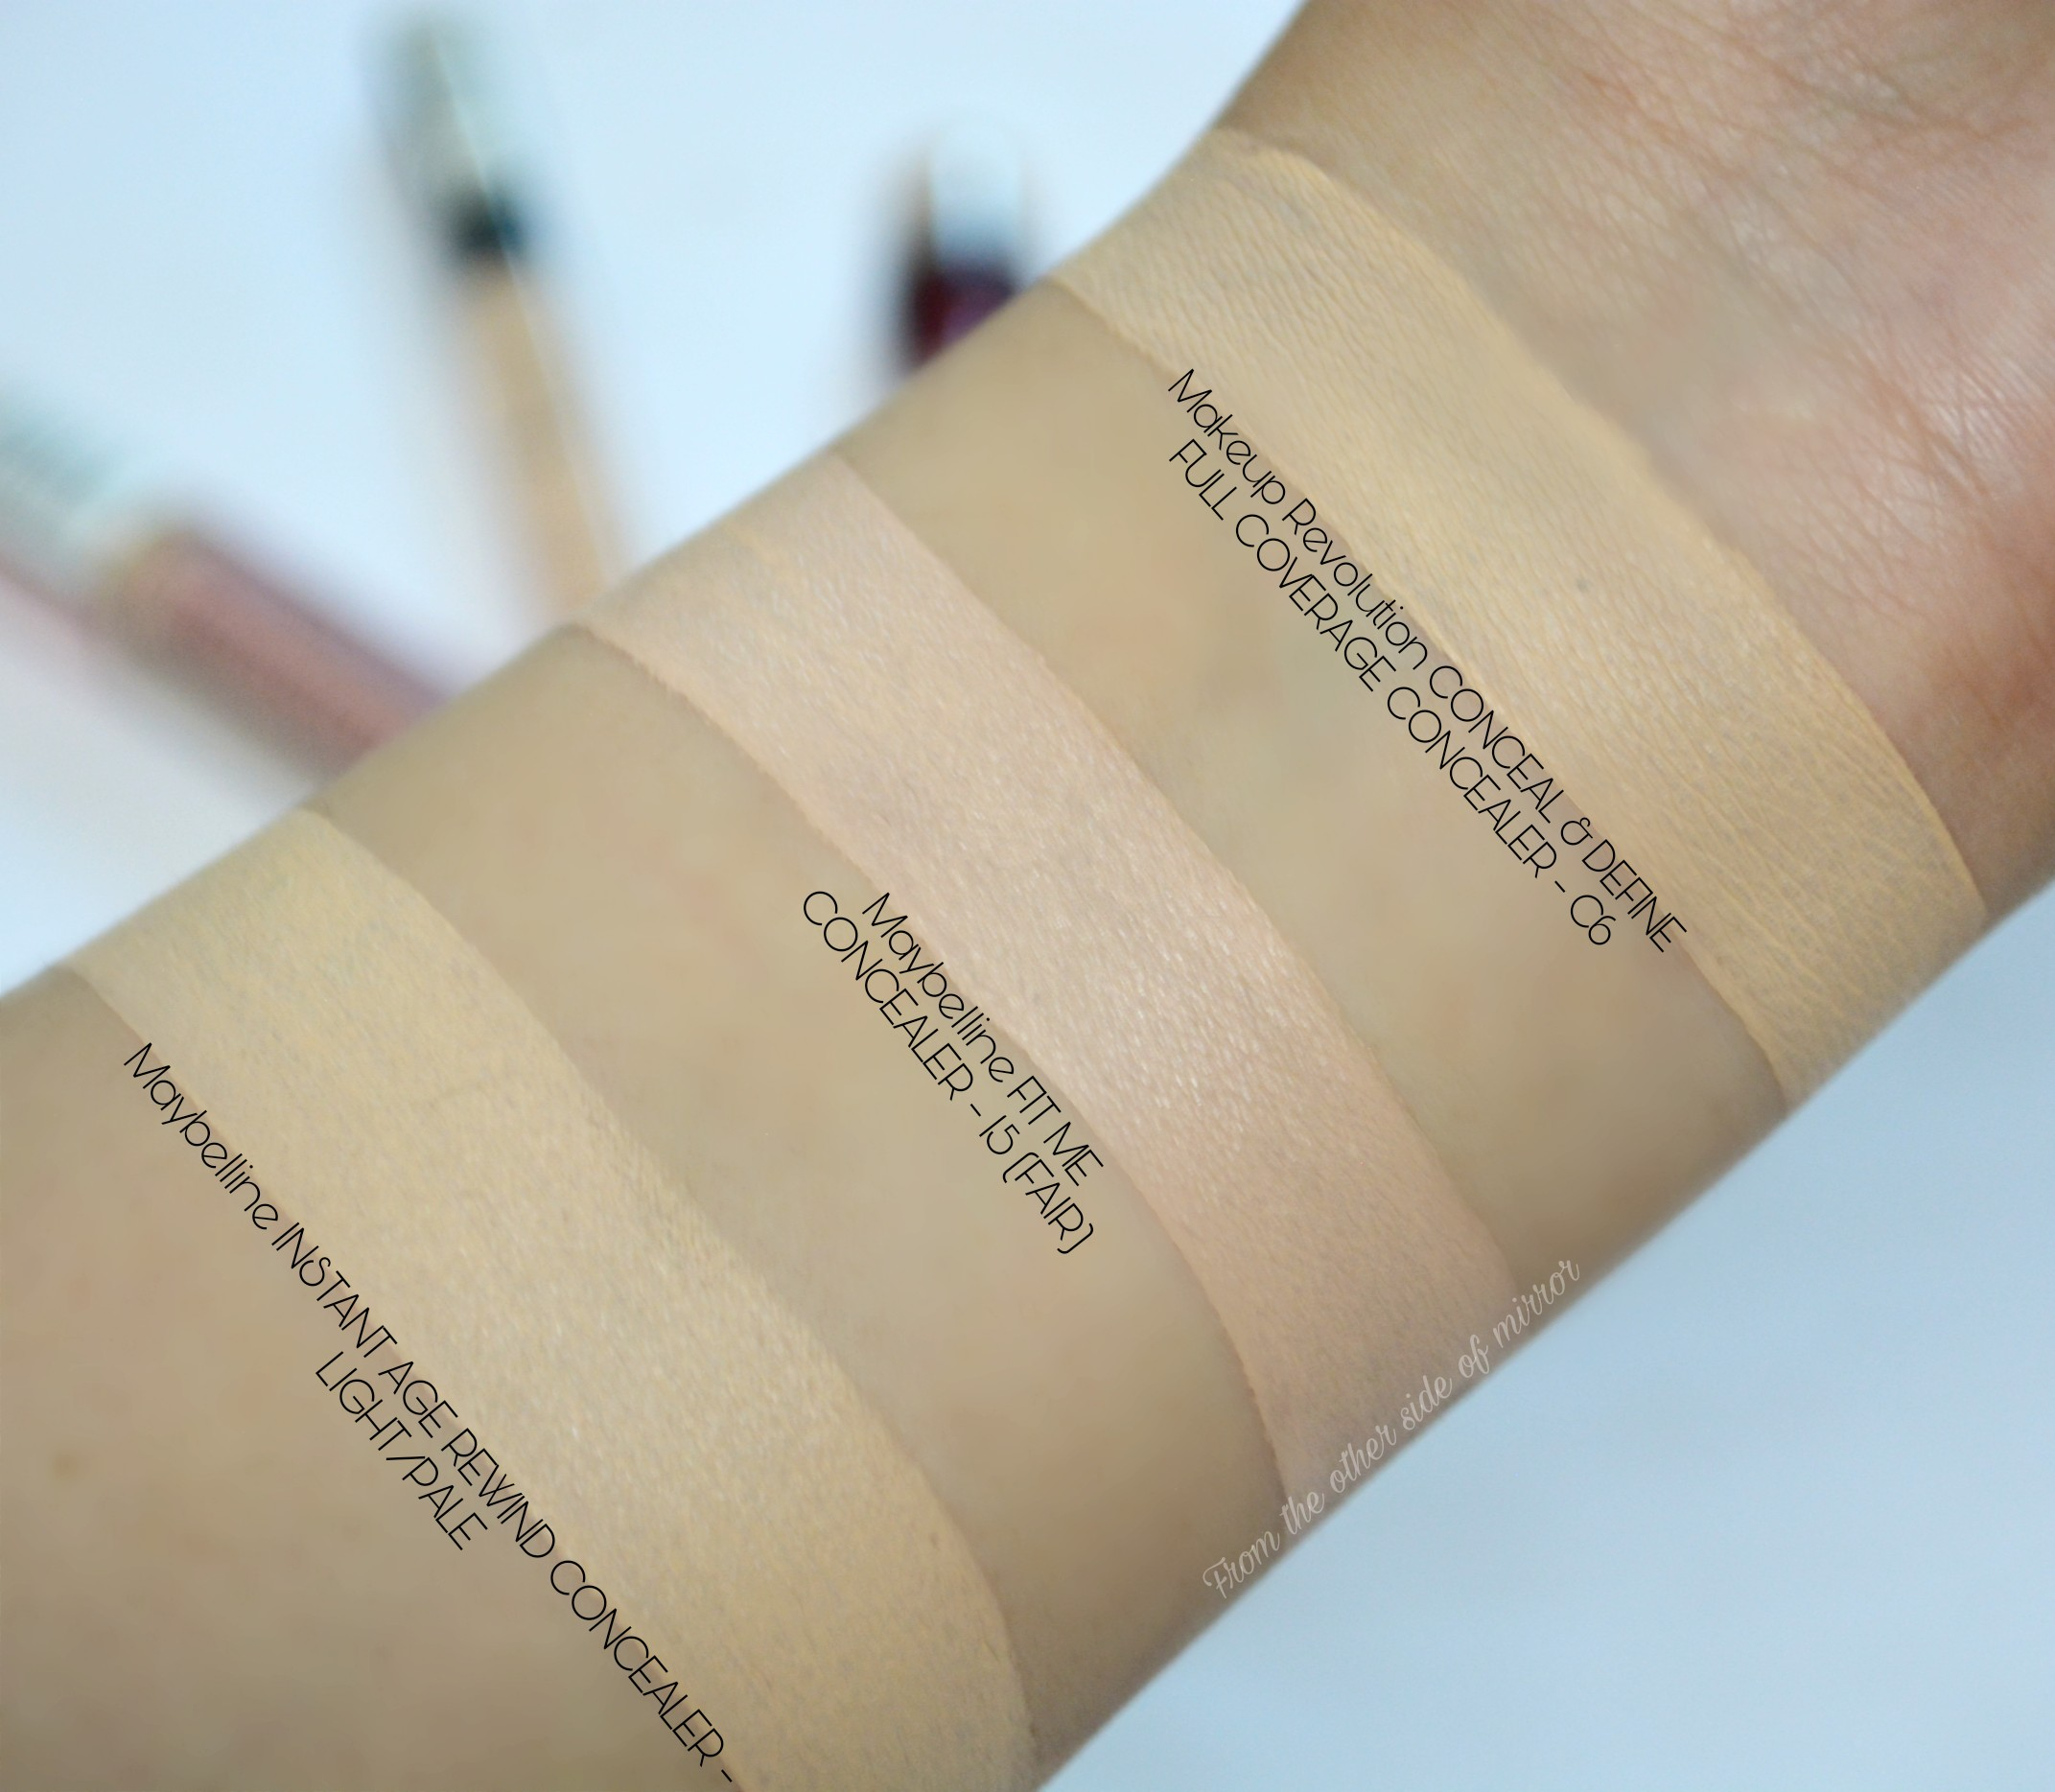 Makeup Revolution Conceal and Define Concealer- Comparison Swatches